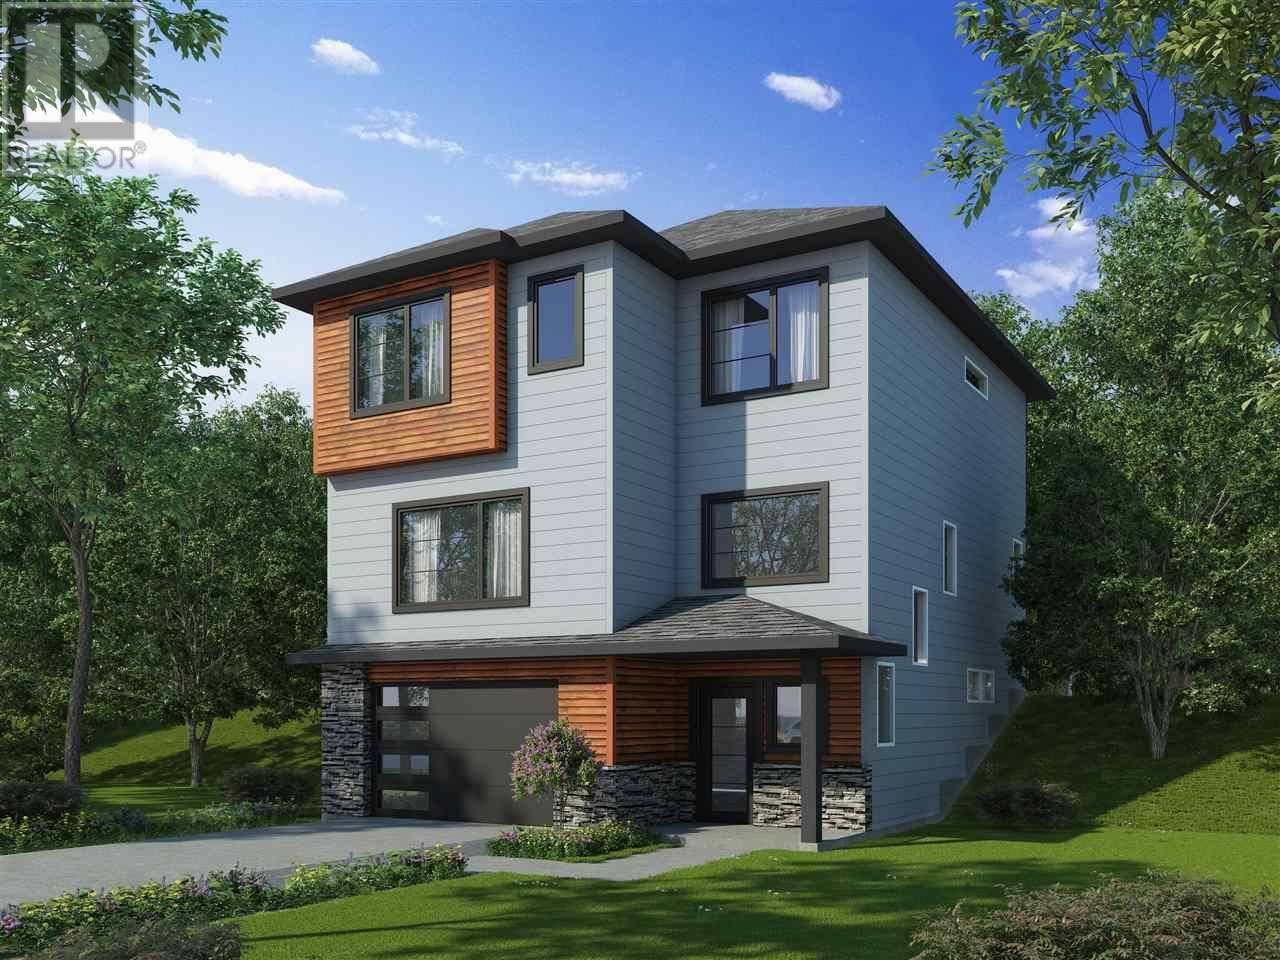 House for sale at 408 Alabaster Wy Unit 721 Spryfield Nova Scotia - MLS: 201811555